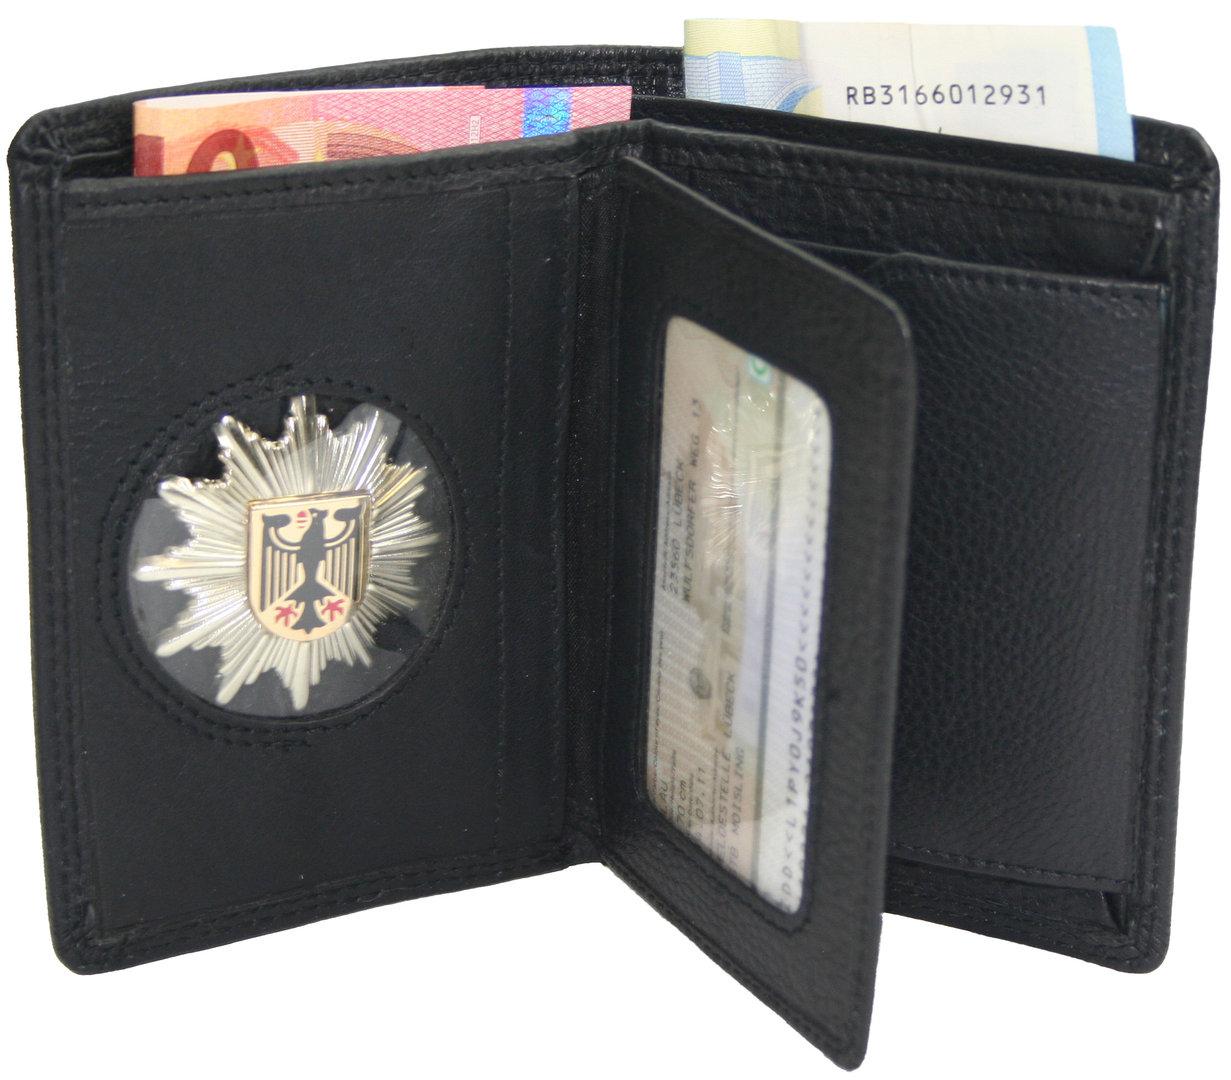 ad209c6e76c60 Geldbörse Echtleder  Geldbörse Echtleder ...